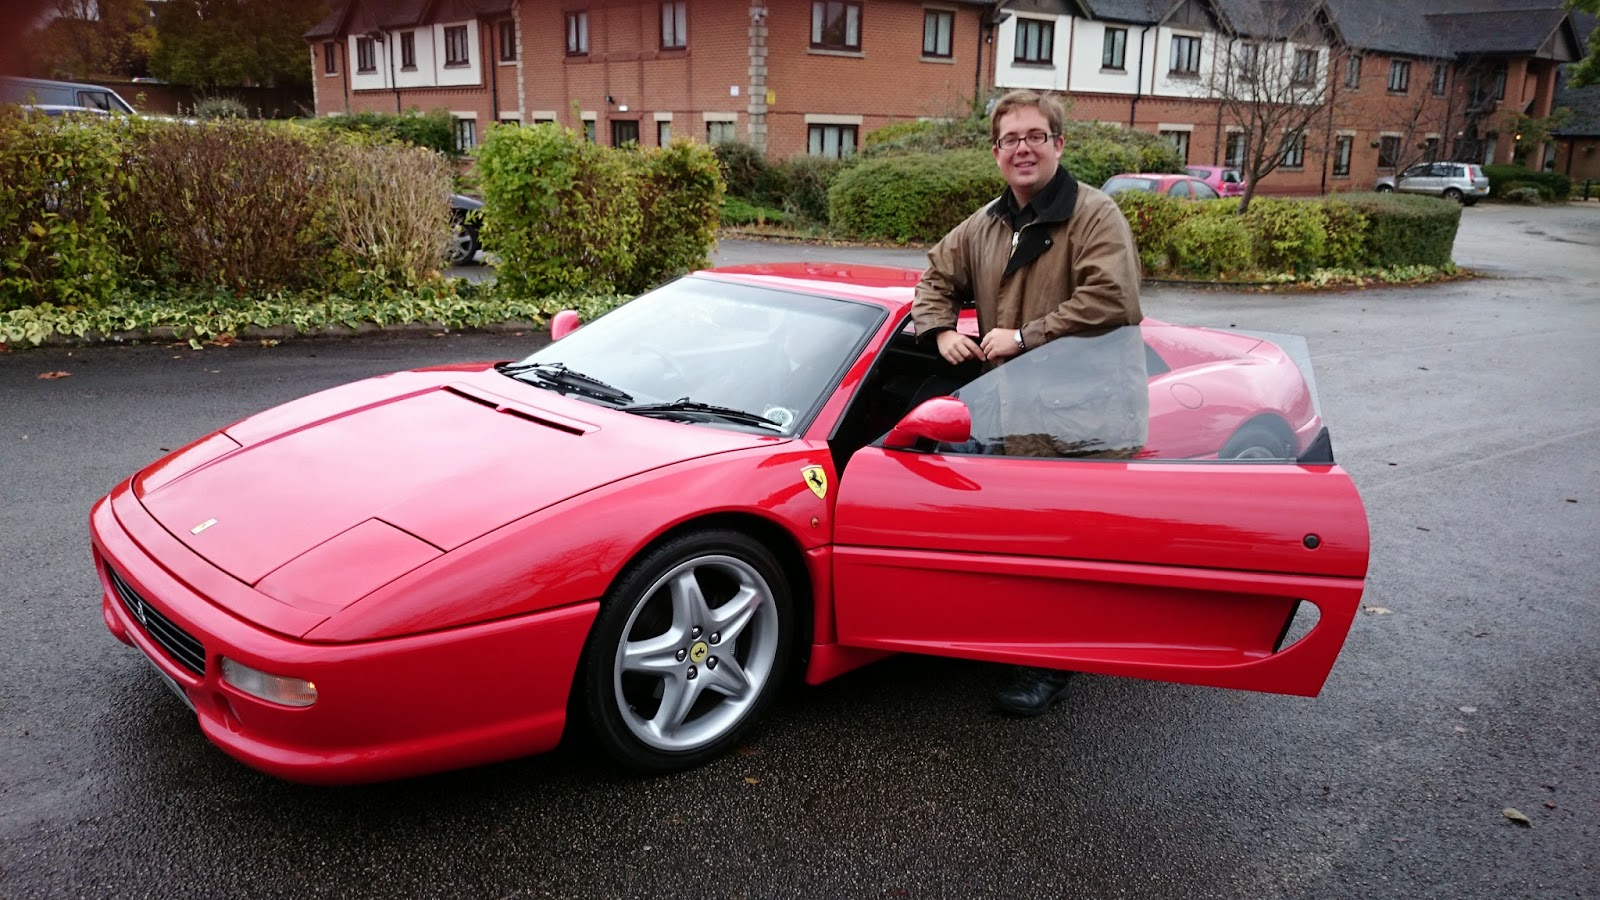 Life on cars why i want a ferrari f355 for christmas for Ferrari christmas